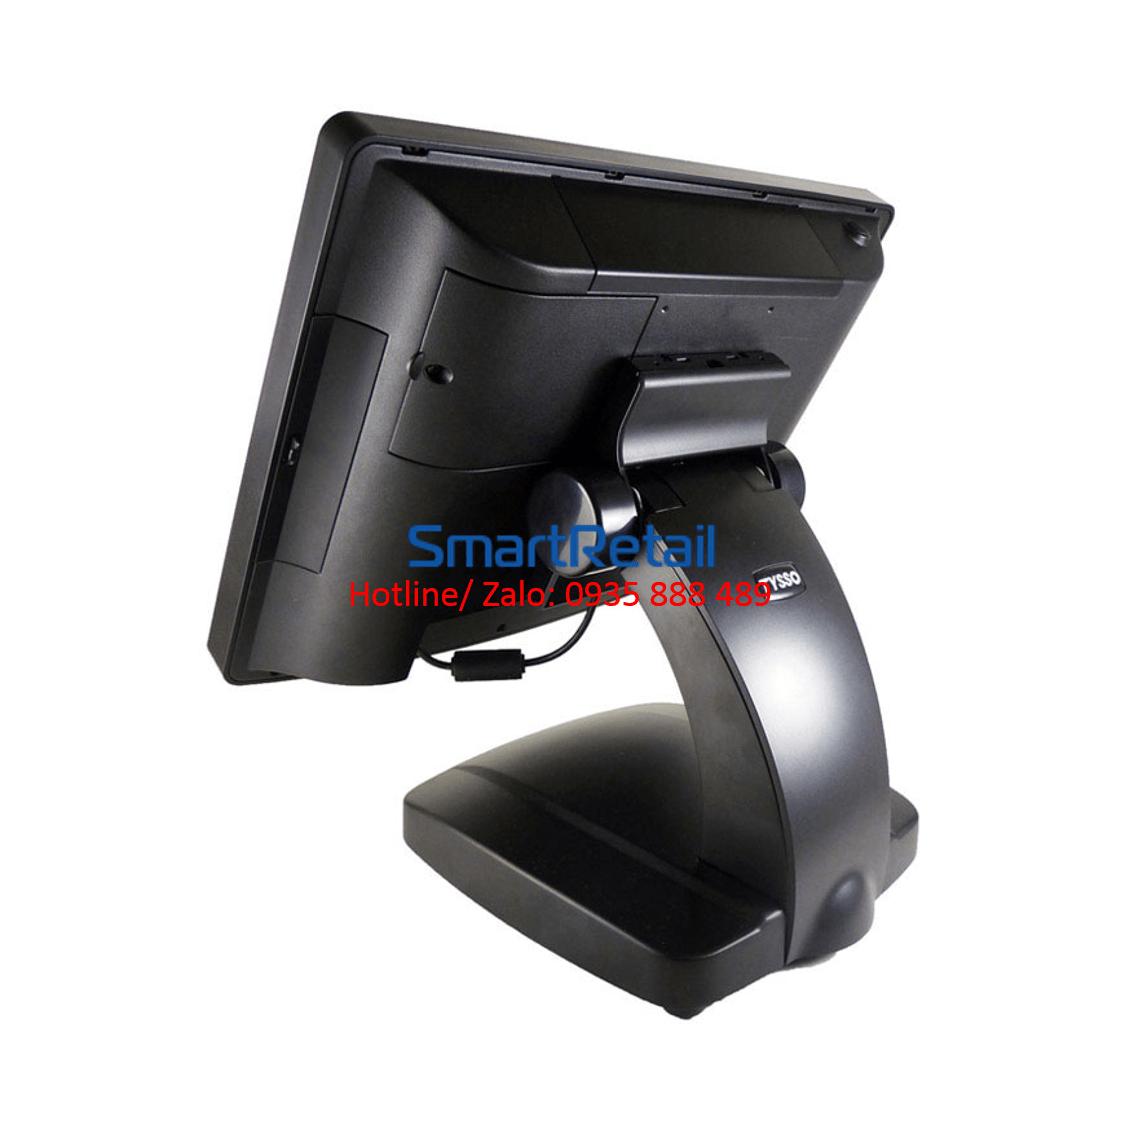 SmartRetail máy tính tiền TYSSO POS 6000 2